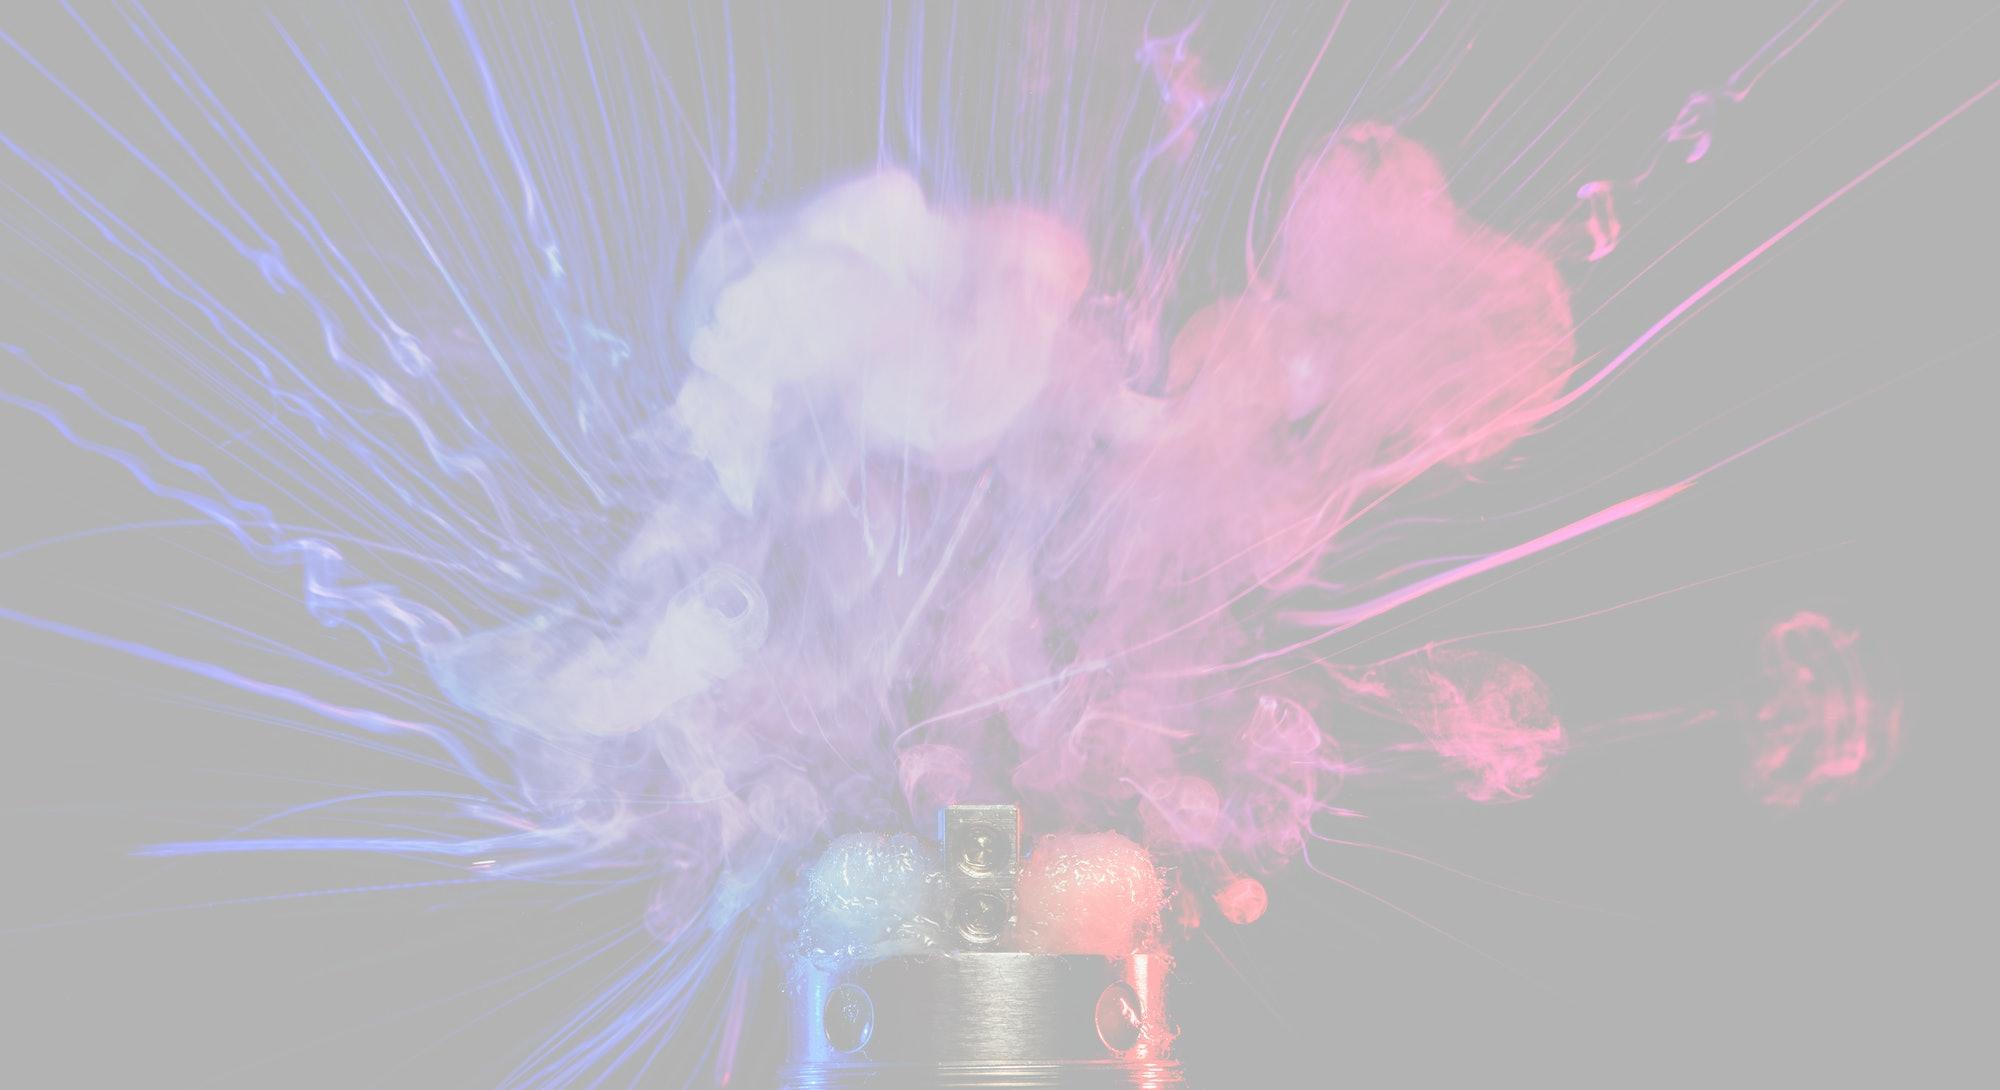 Electronic Cigarette vape explosion. Dark background.